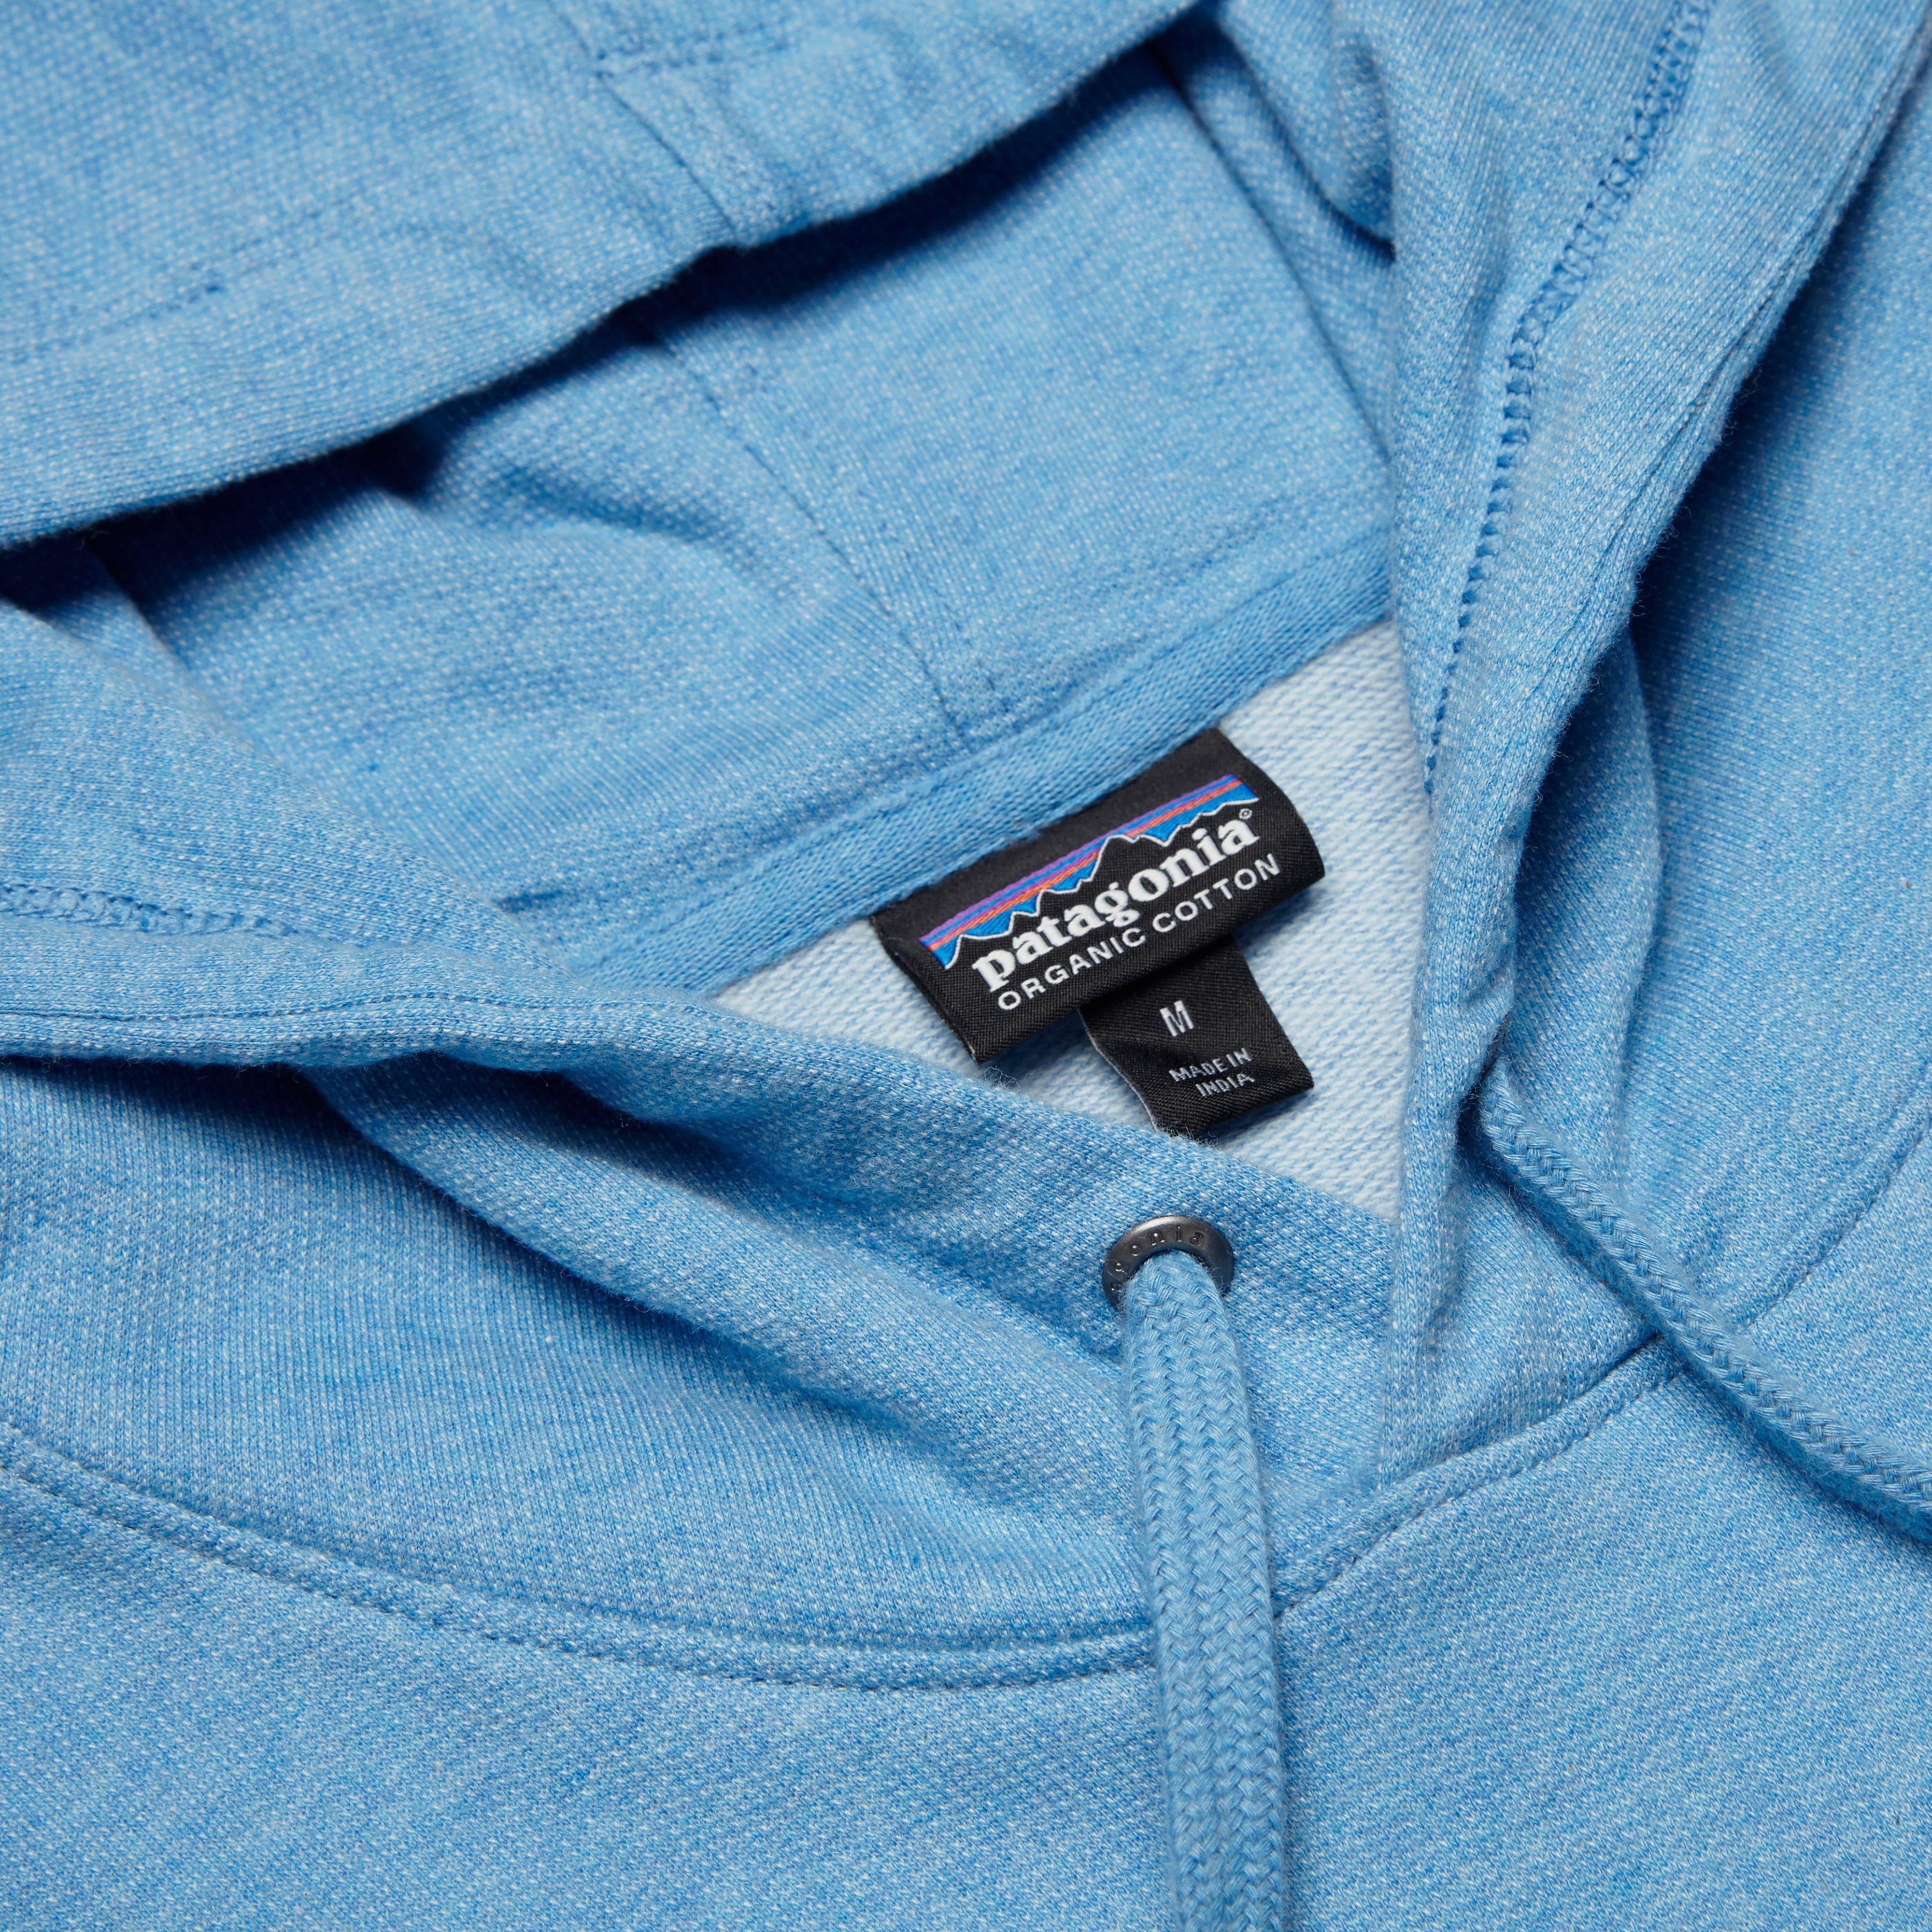 patagonia m 39 s line logo badge lw hoody in blue for men lyst. Black Bedroom Furniture Sets. Home Design Ideas